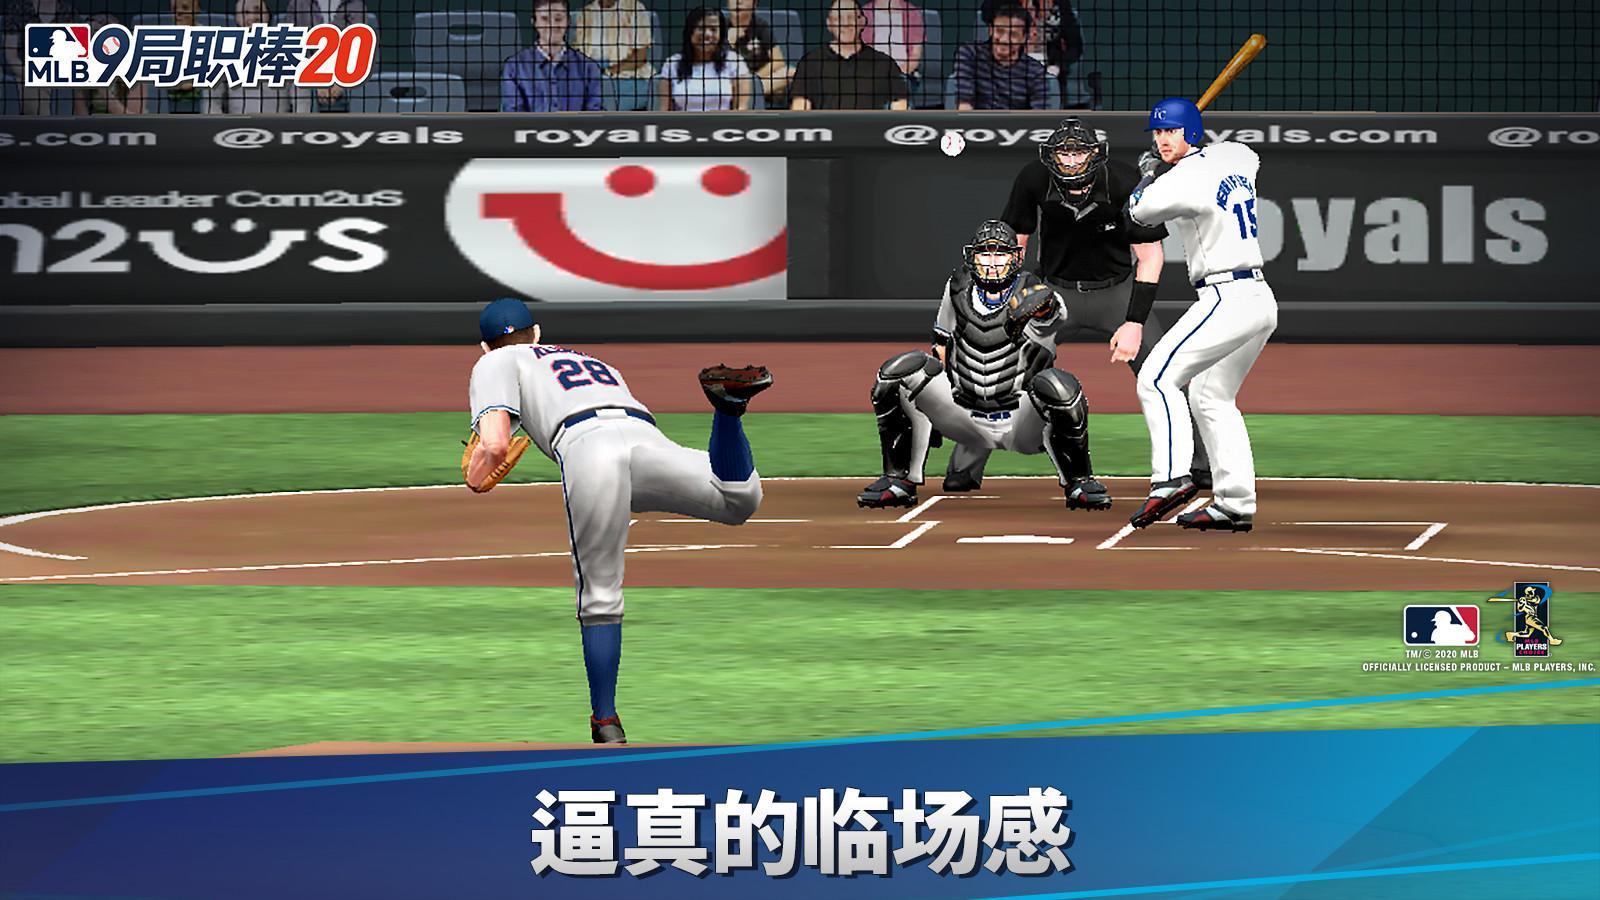 MLB:9局职棒19 游戏截图3